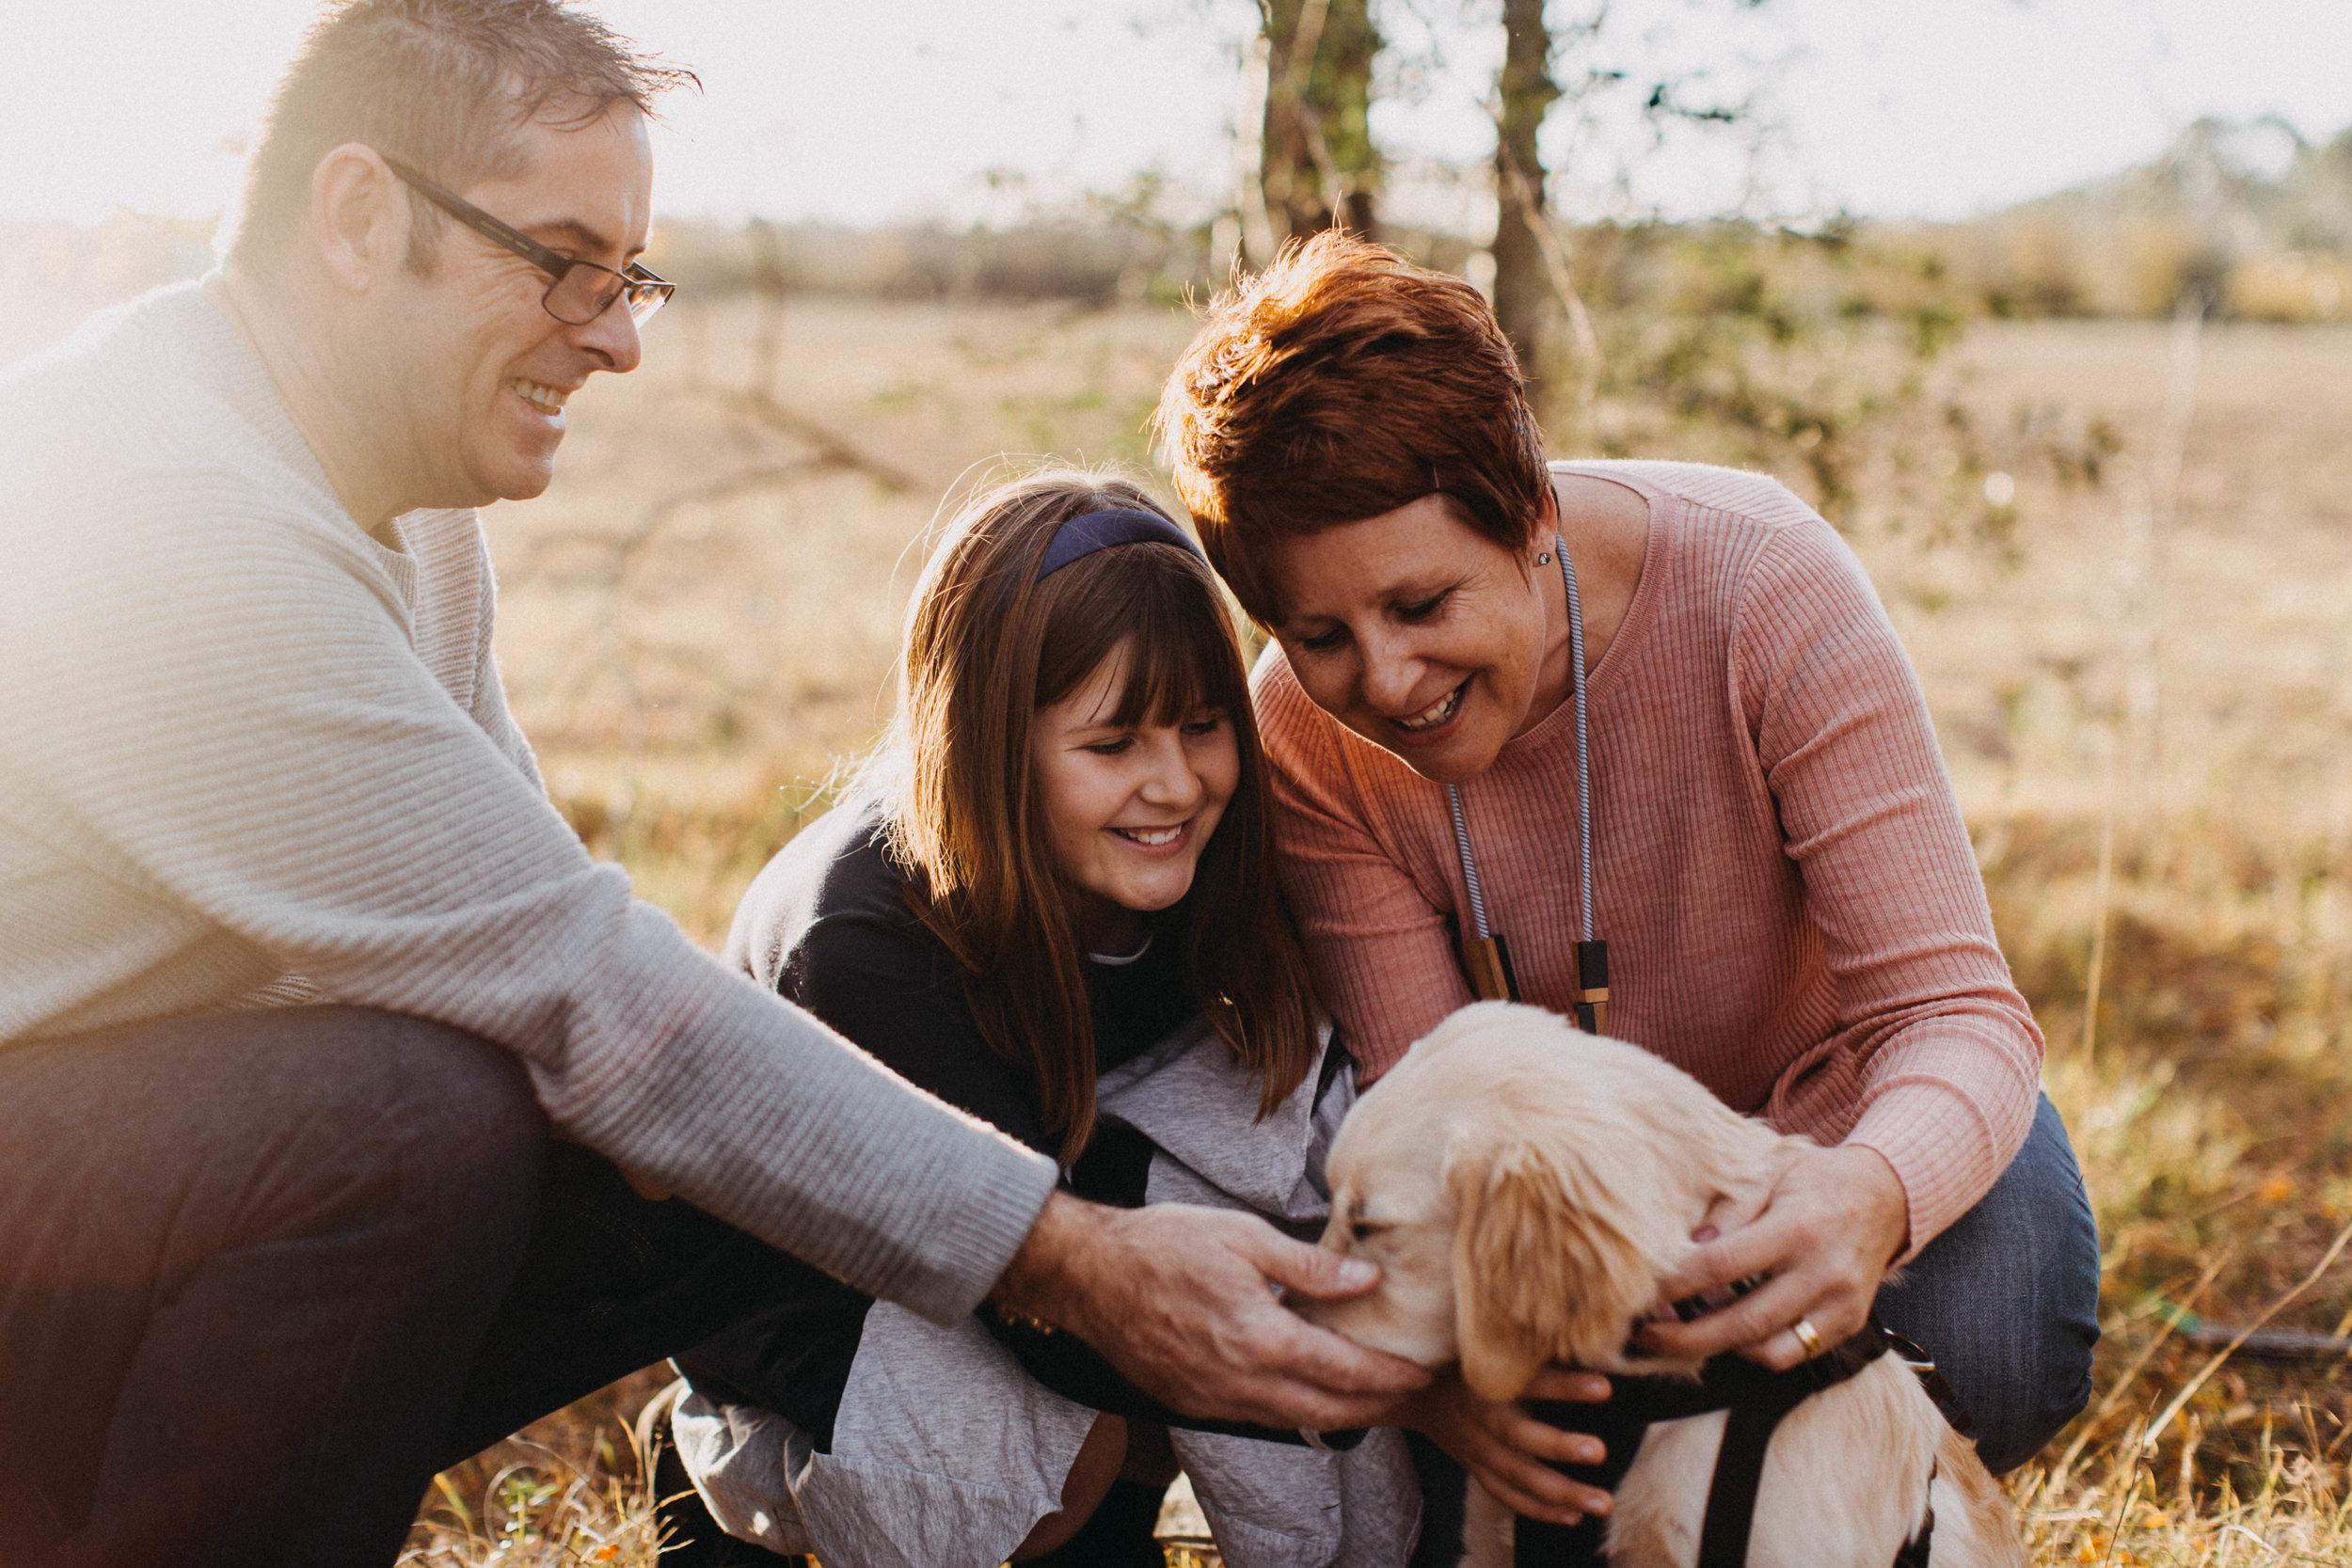 camden-macarthur-family-photography-www.emilyobrienphotography.net-2.jpg